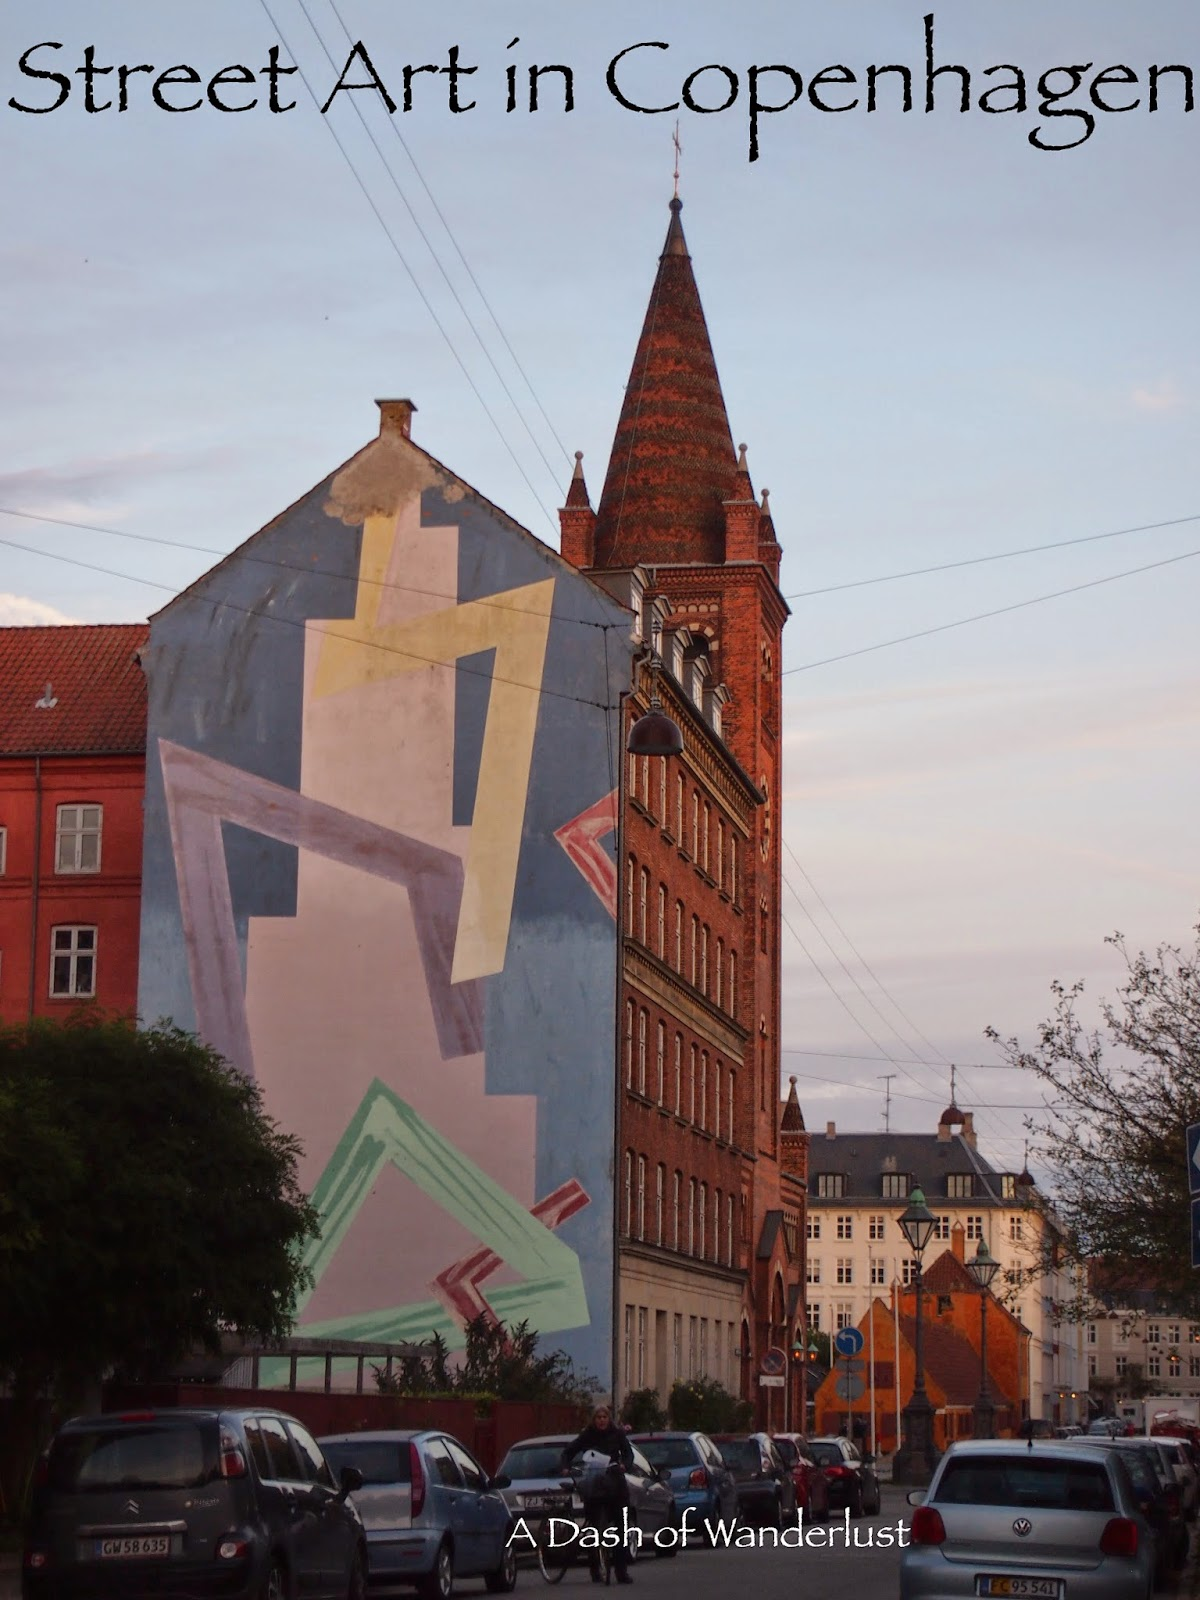 geometric street art covering the side of a building in Copenhagen